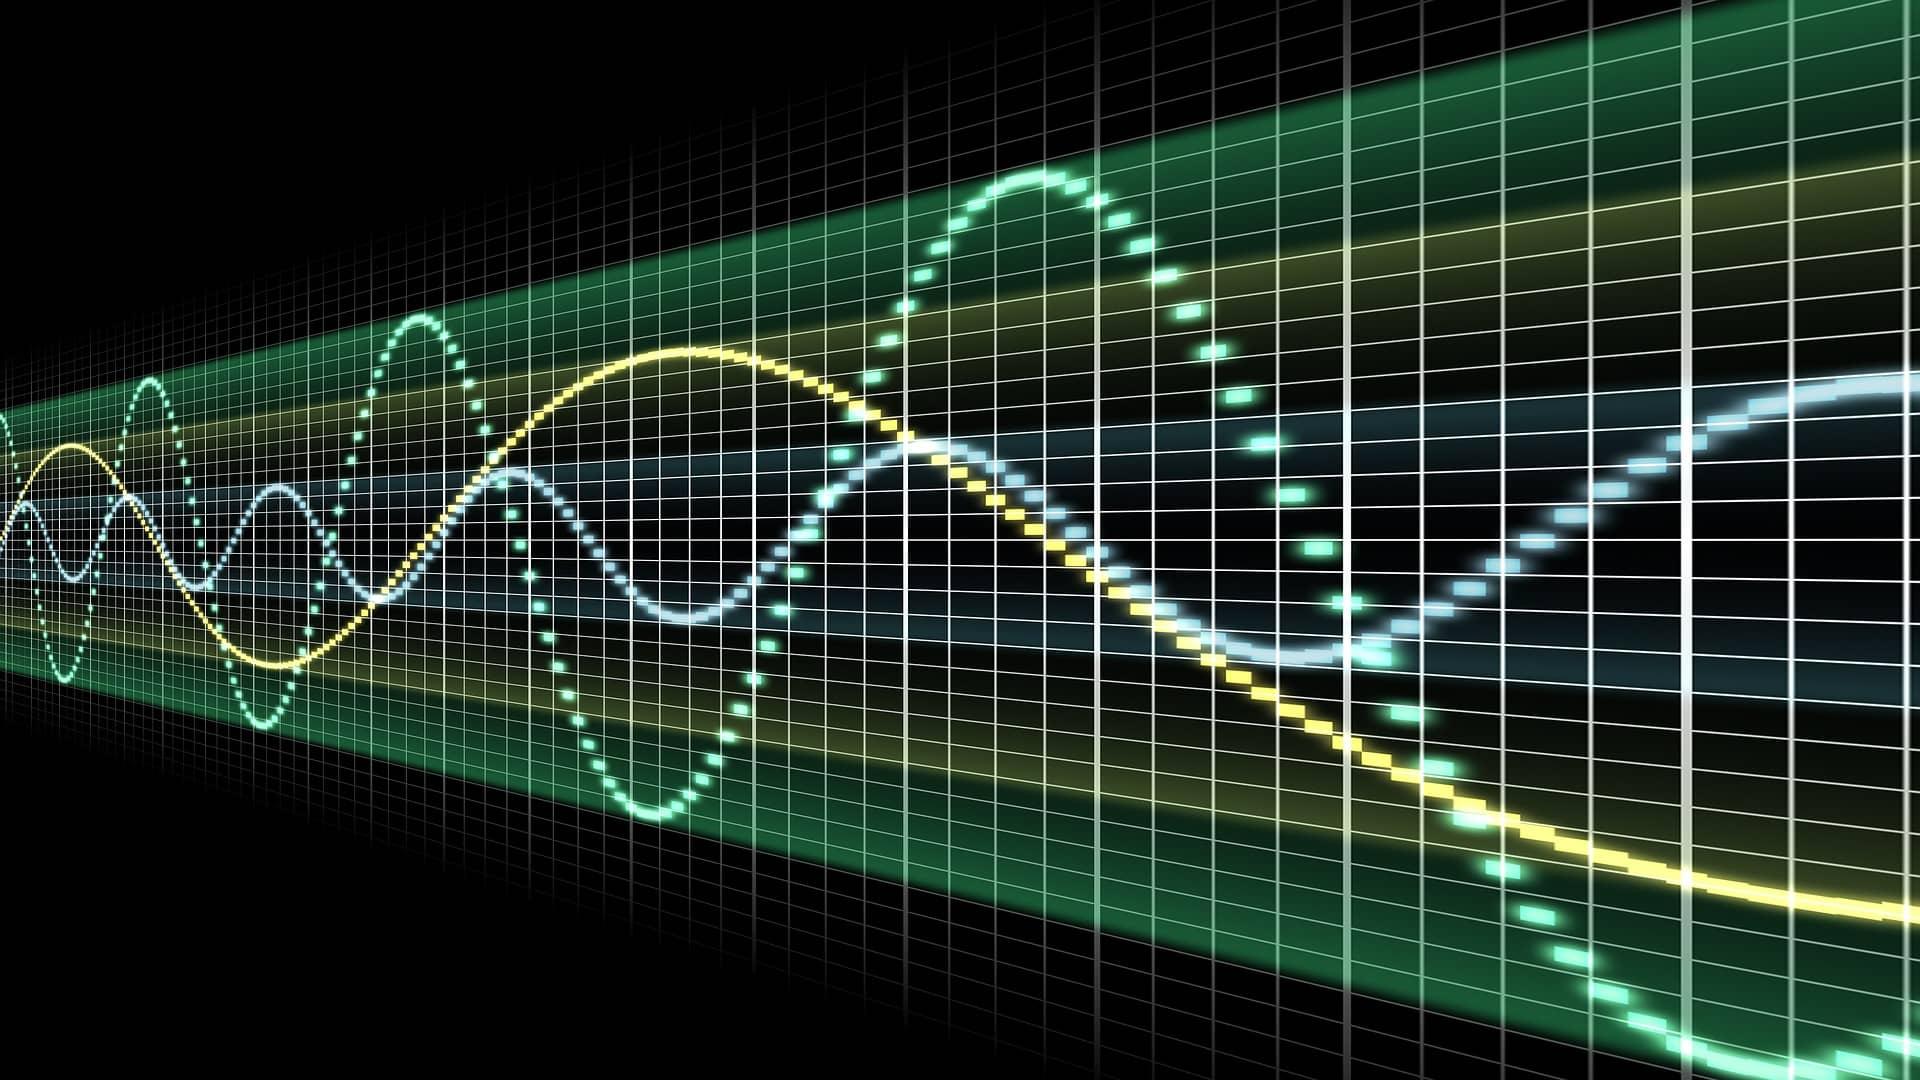 oscilloscope waves